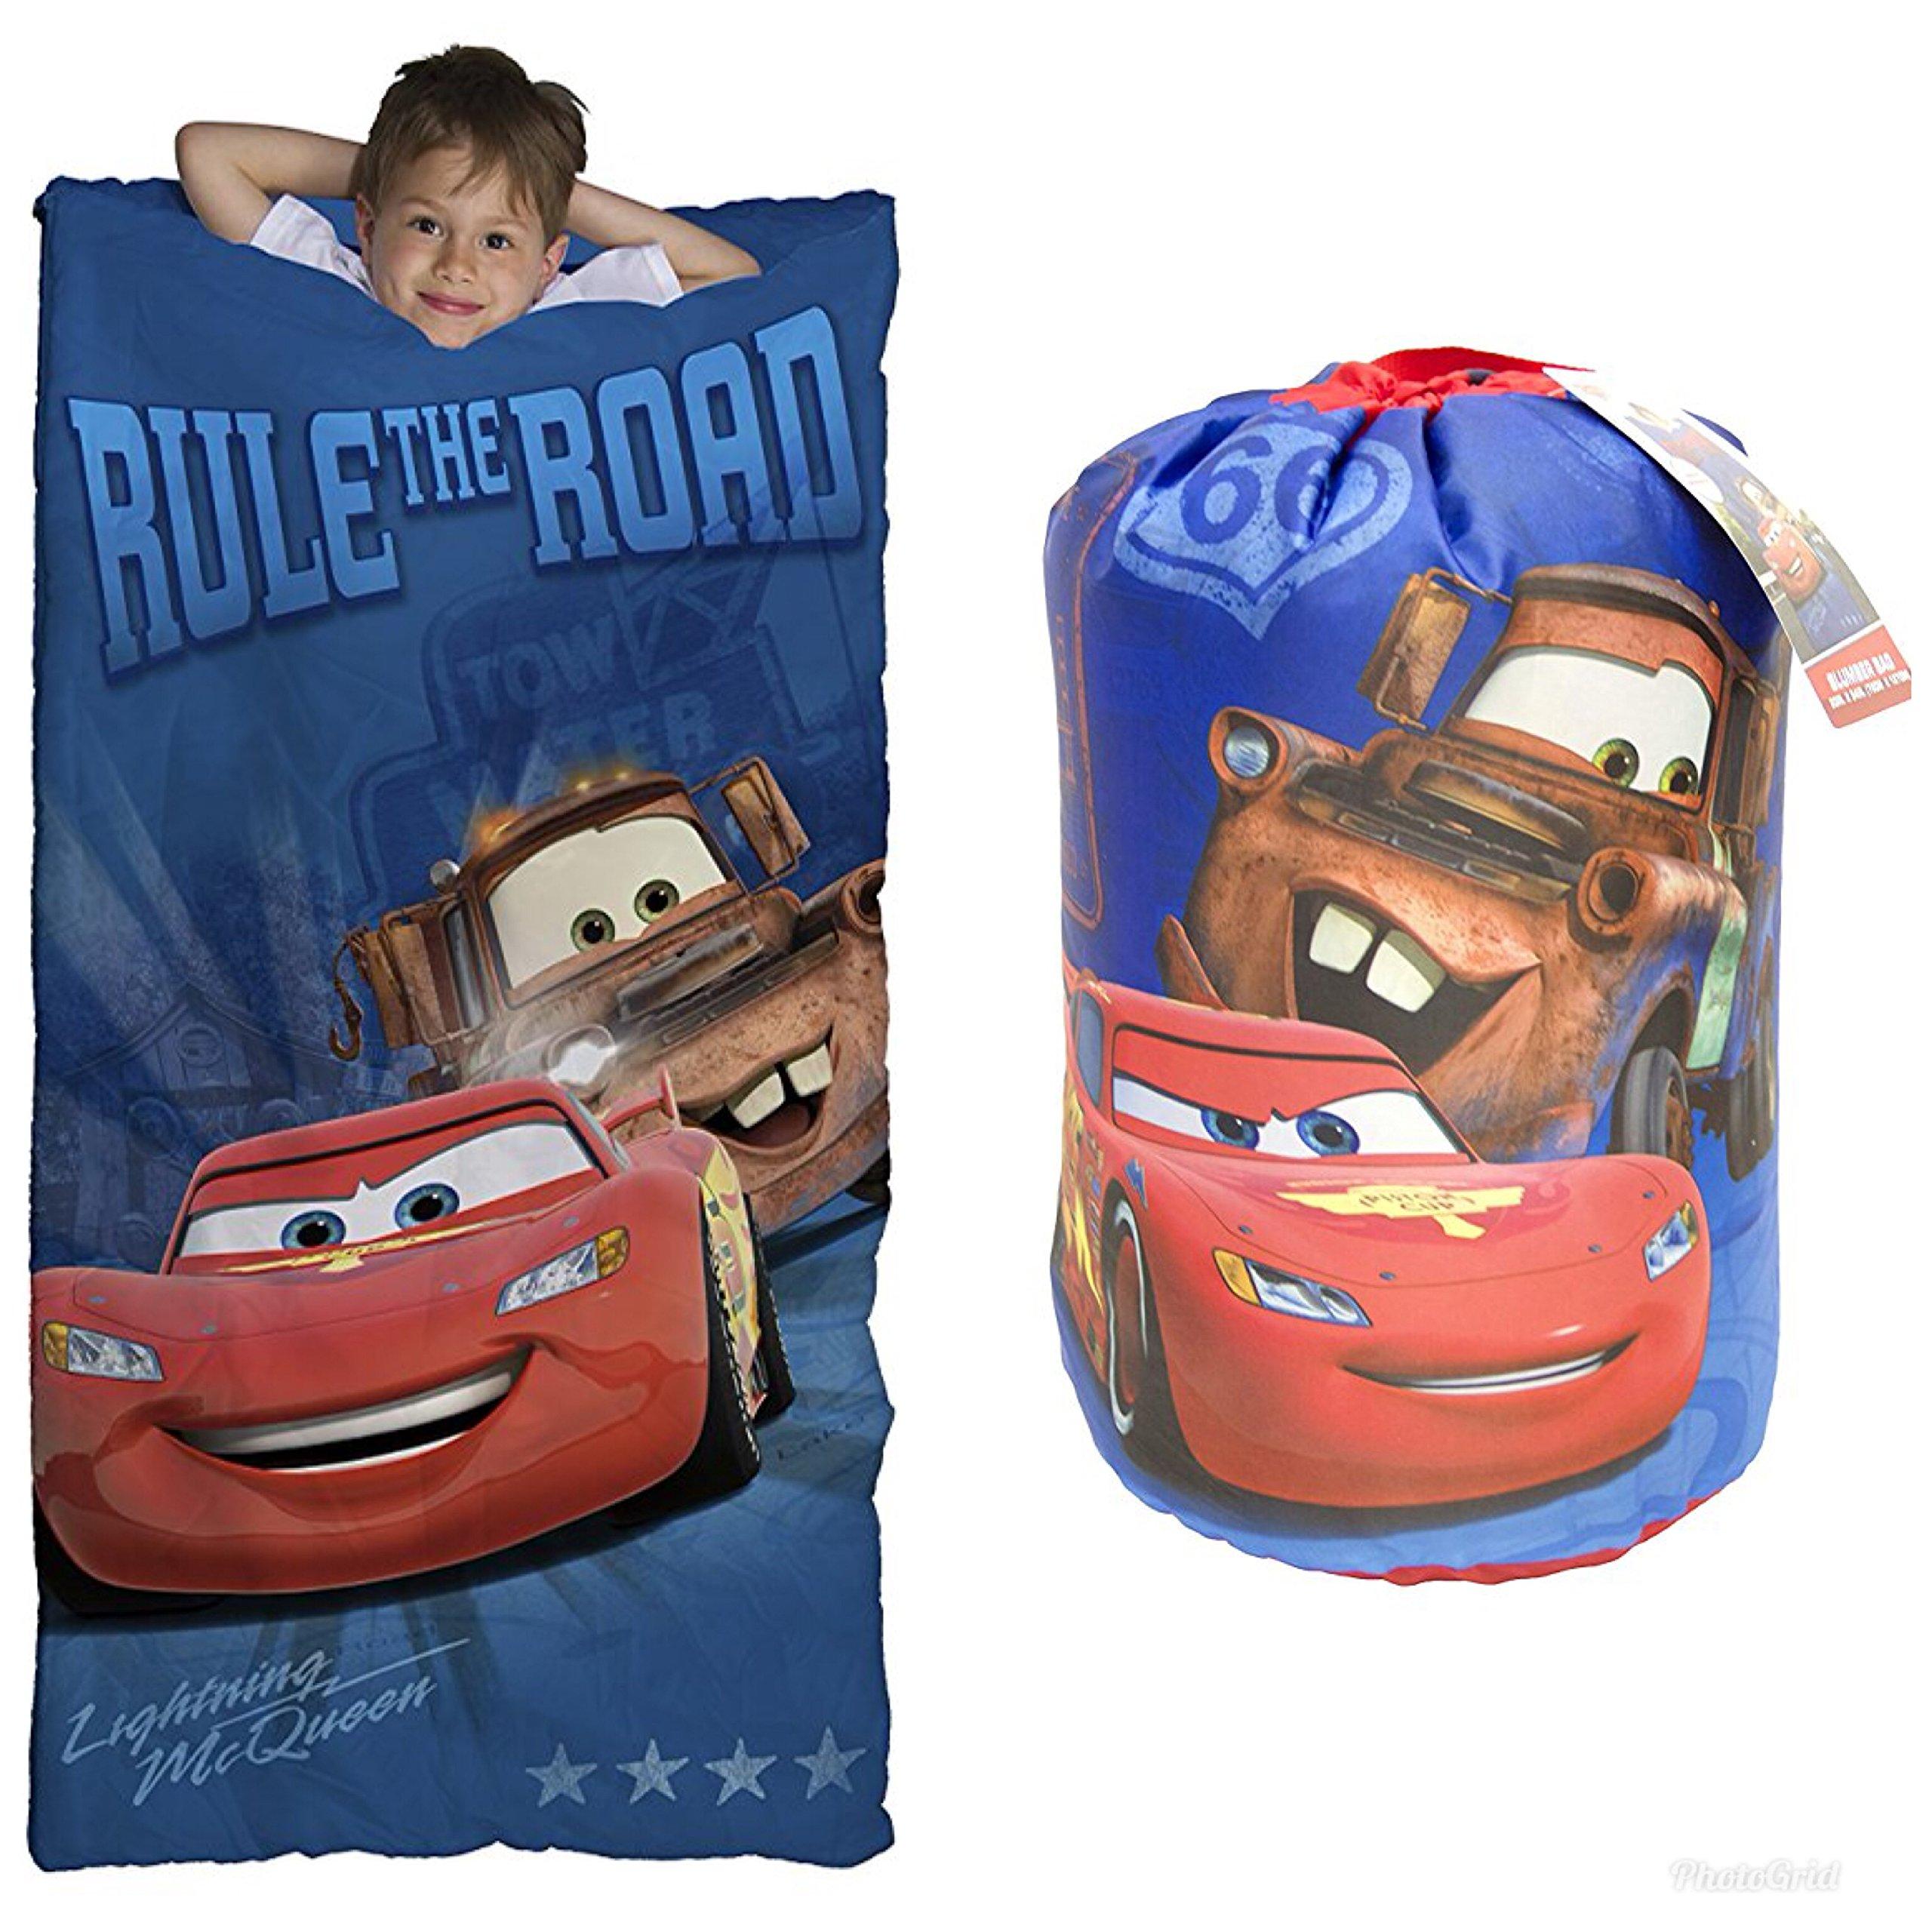 Cars Disney Pixar Sleeping Bag and Sling Slumber Set